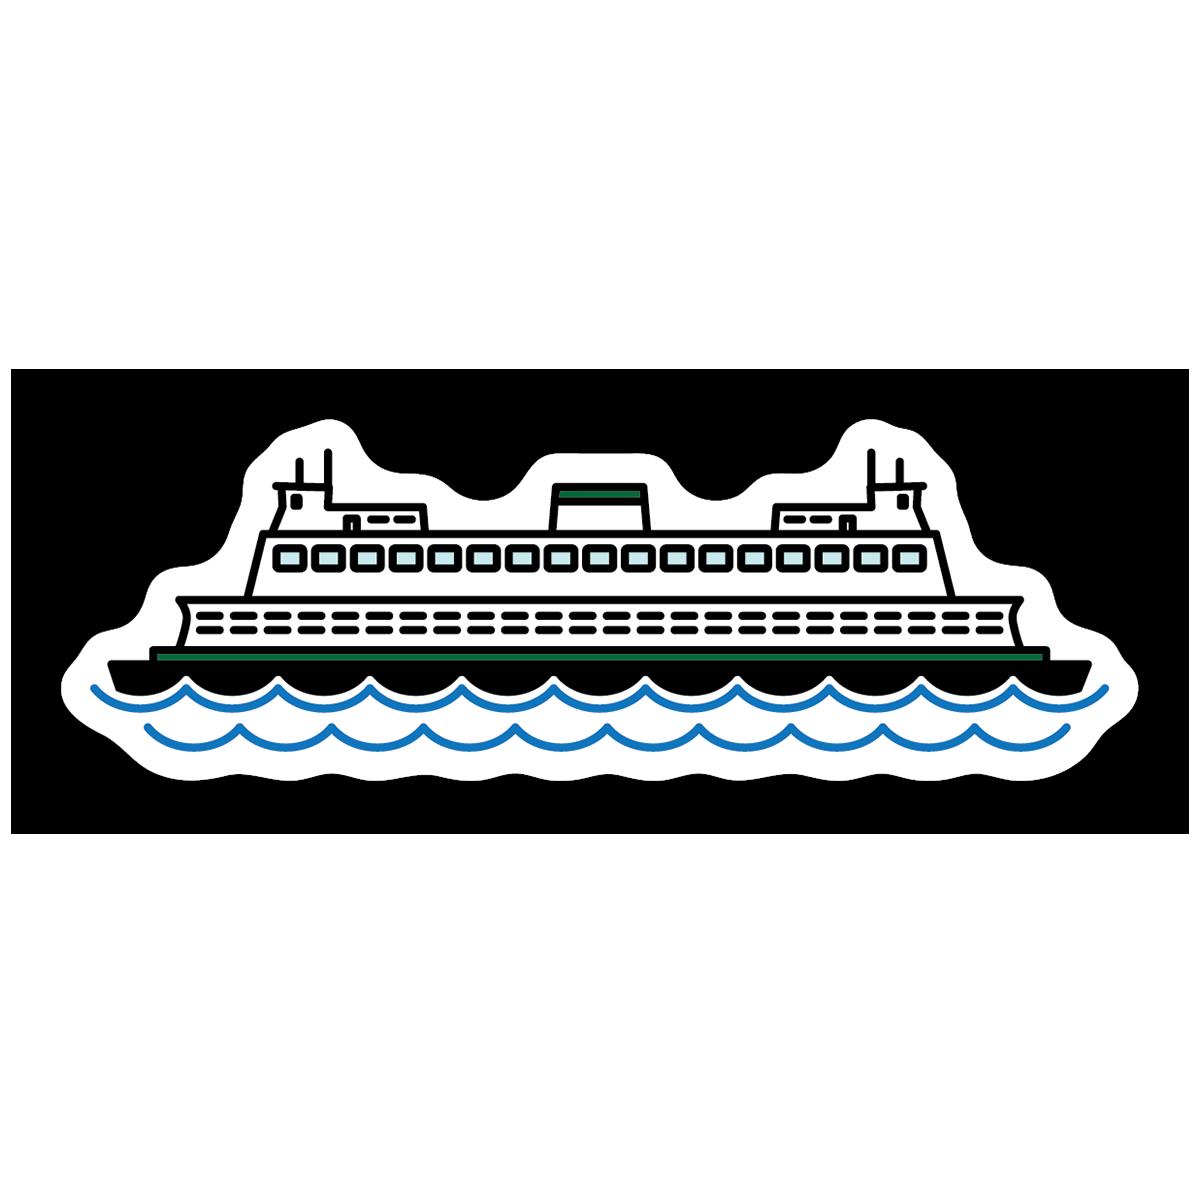 Ferry Boat Sticker Boat Stickers Ferry Boat Boat